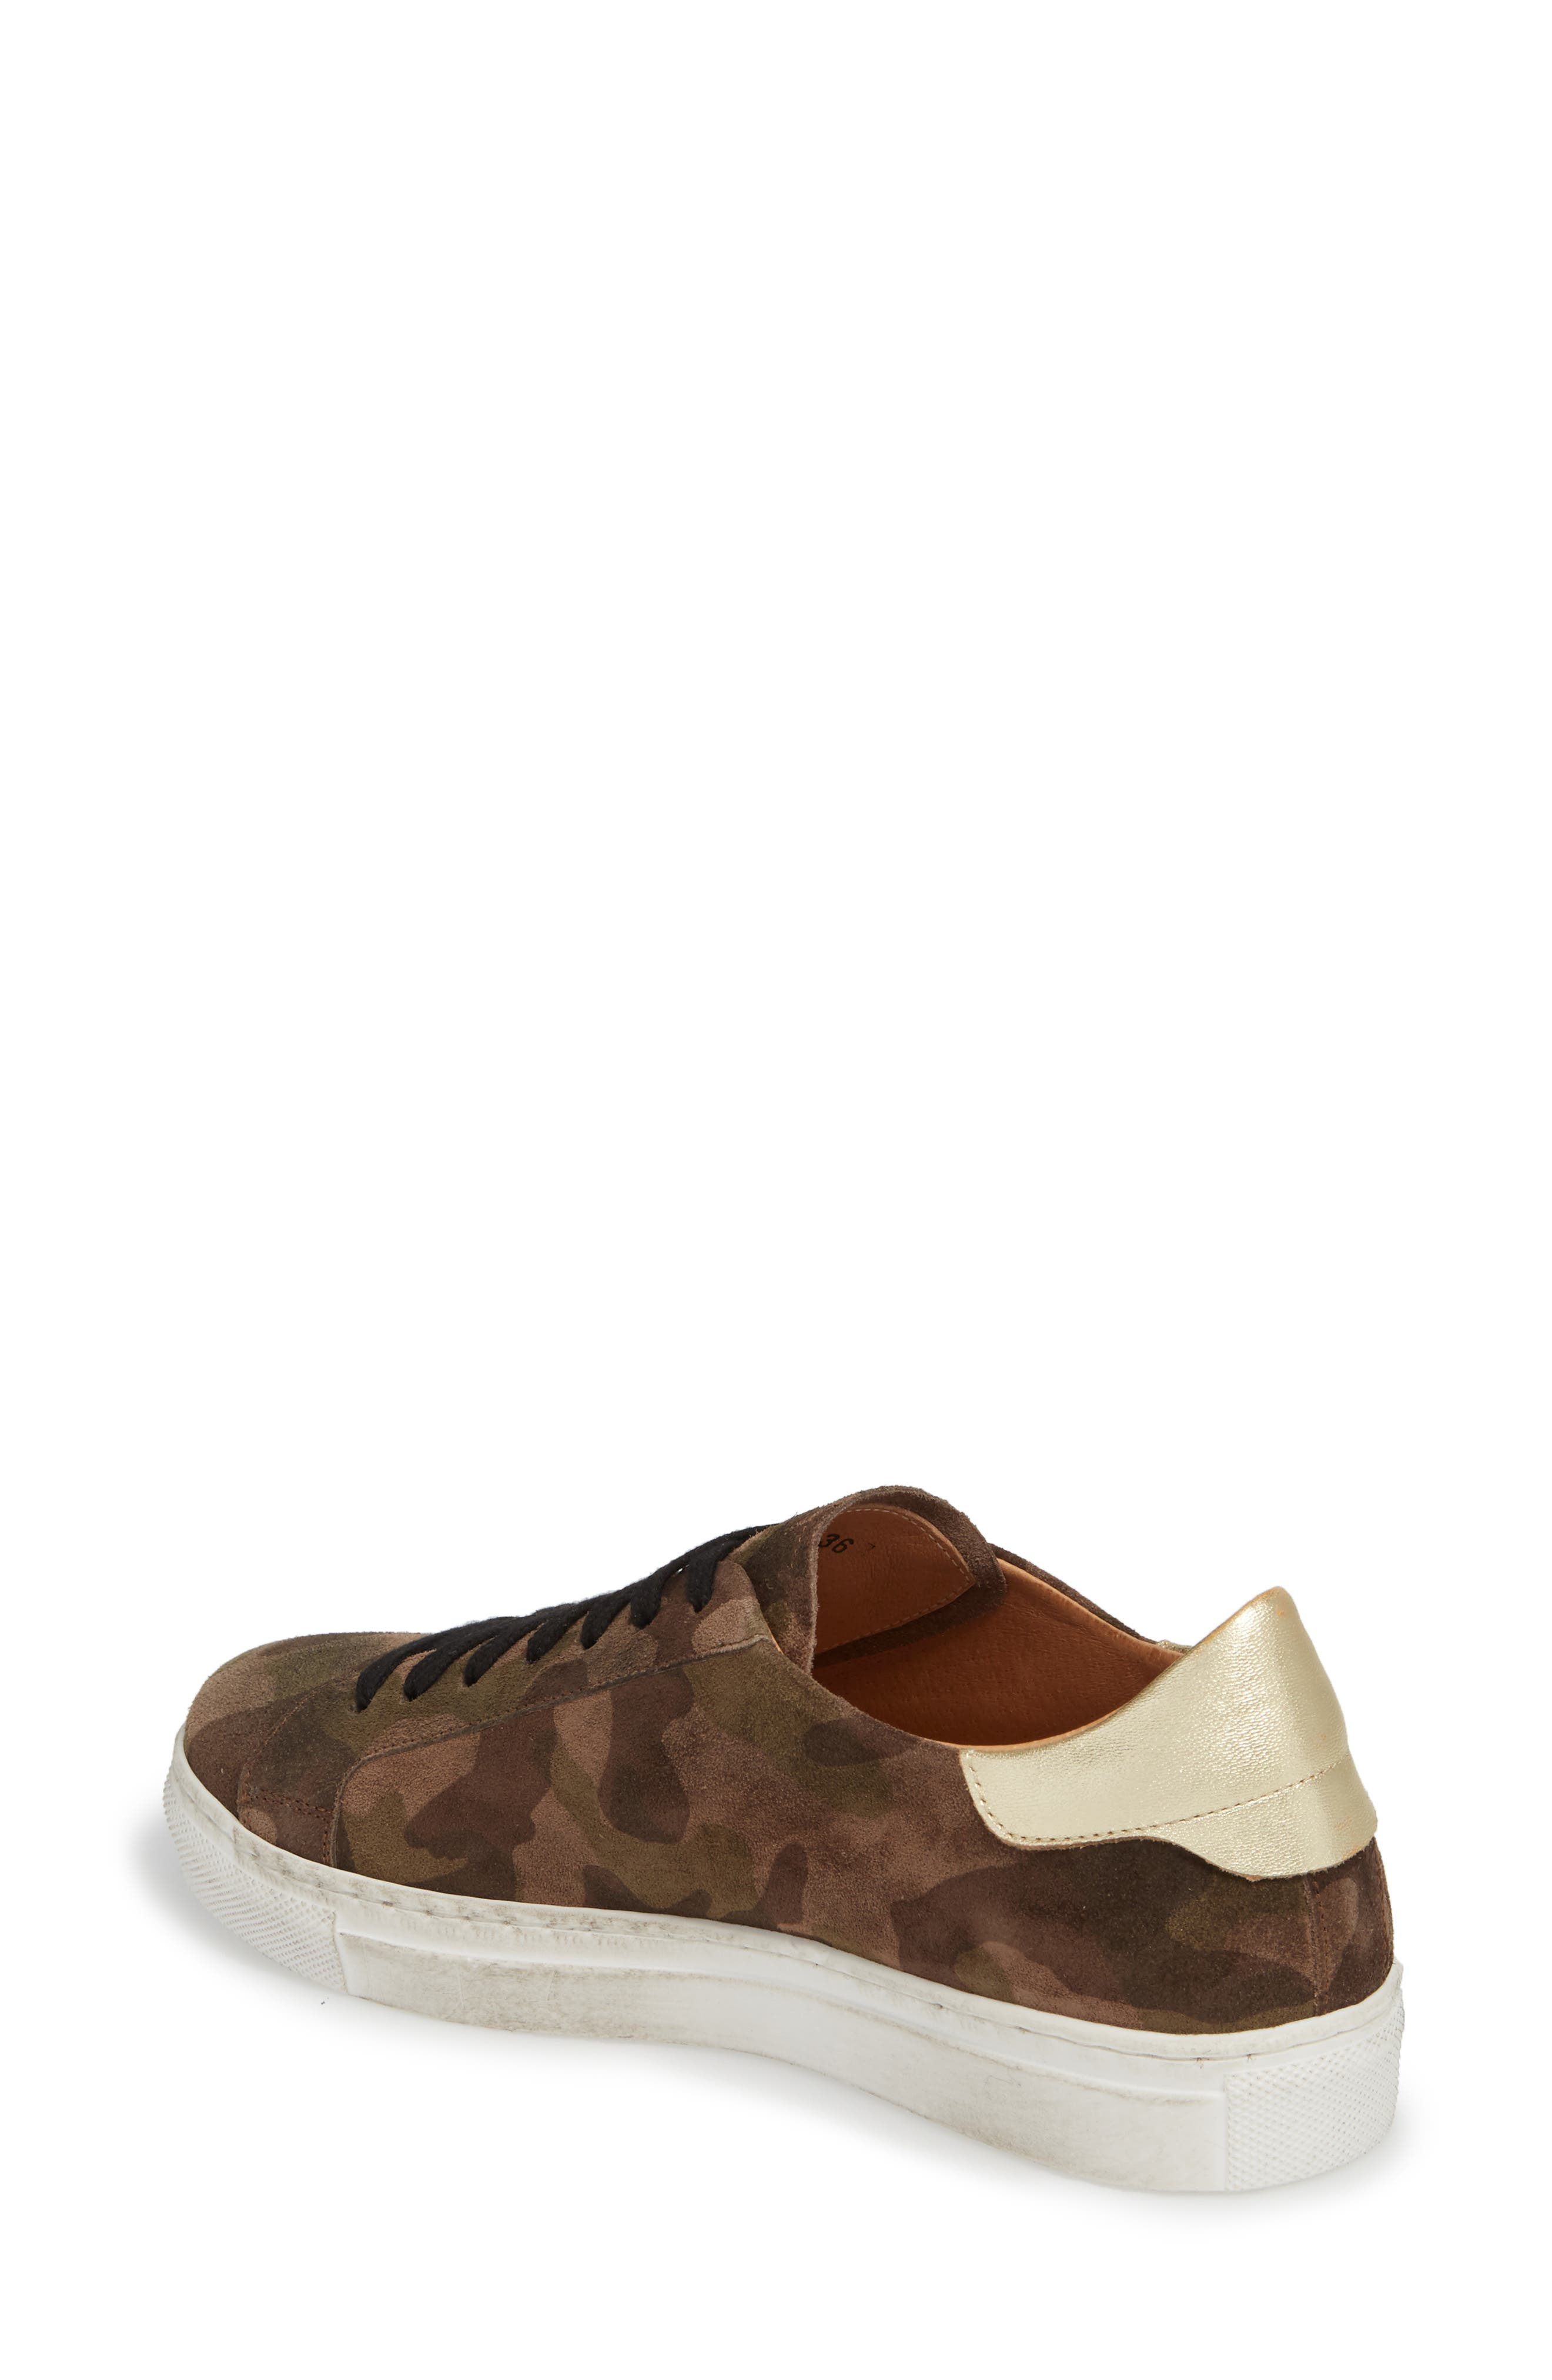 Orissa Sneaker,                             Alternate thumbnail 2, color,                             MILITARY PRINT SUEDE